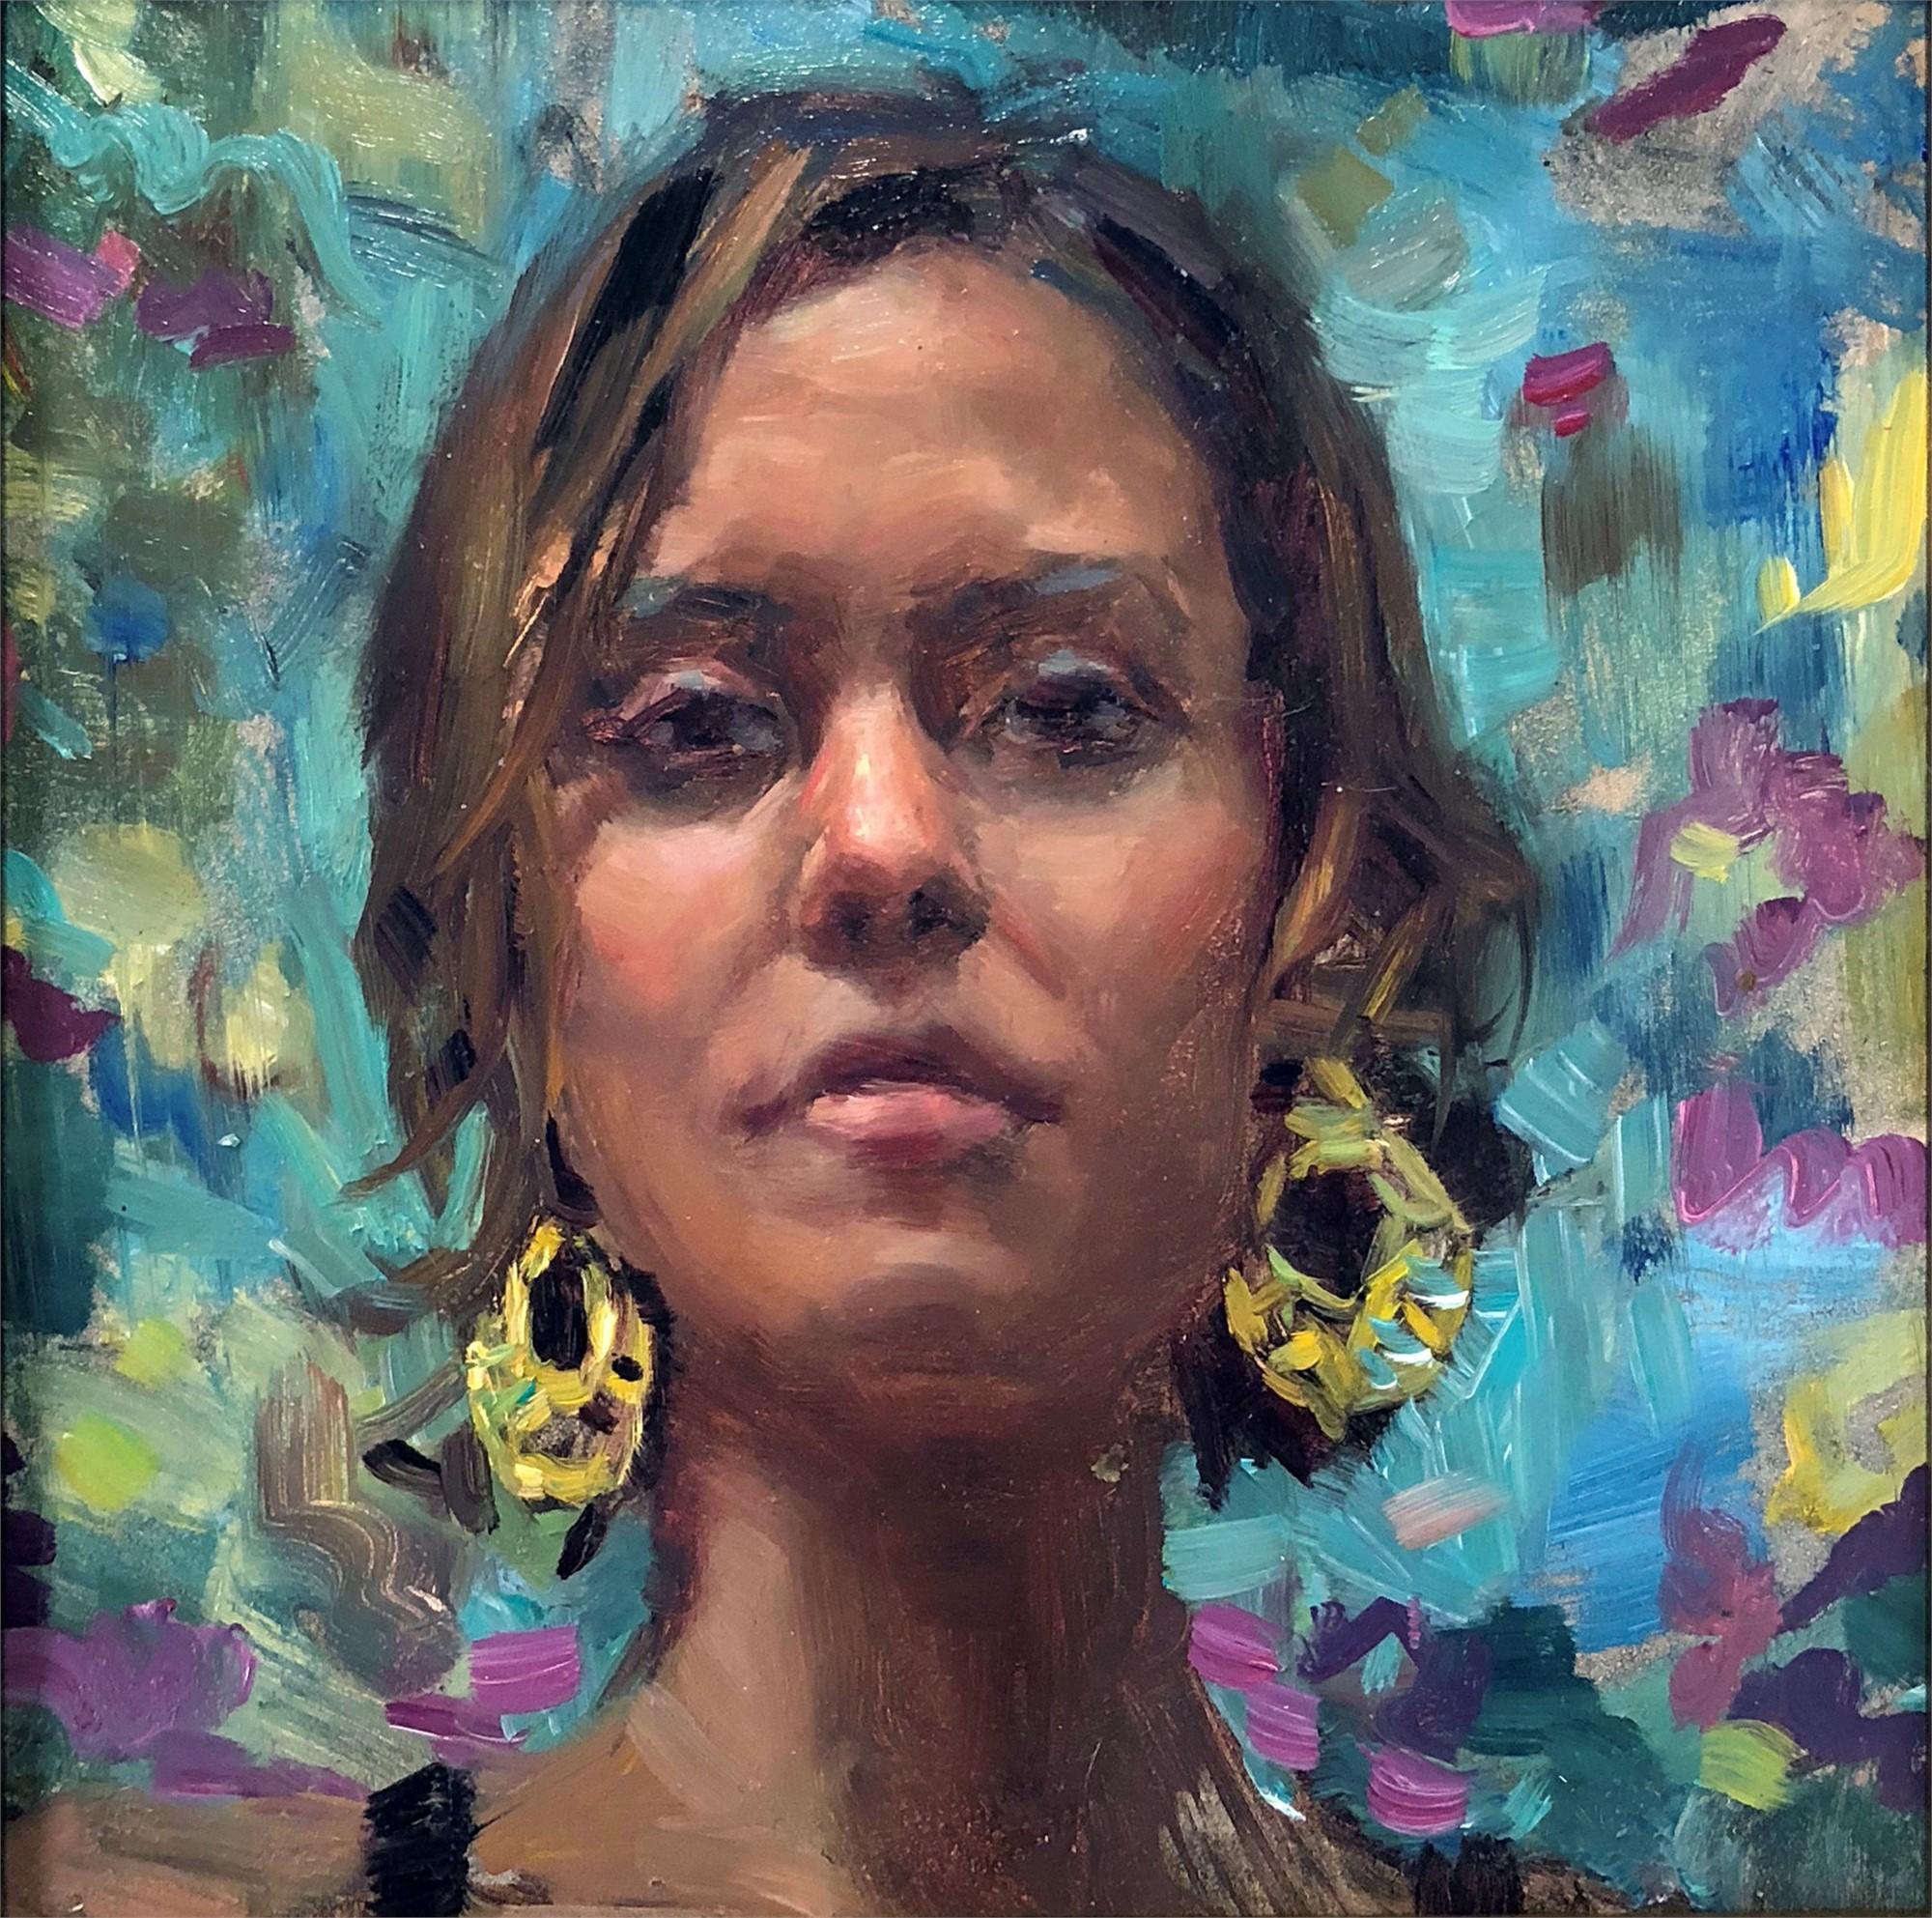 Jaime by Natalia Fabia